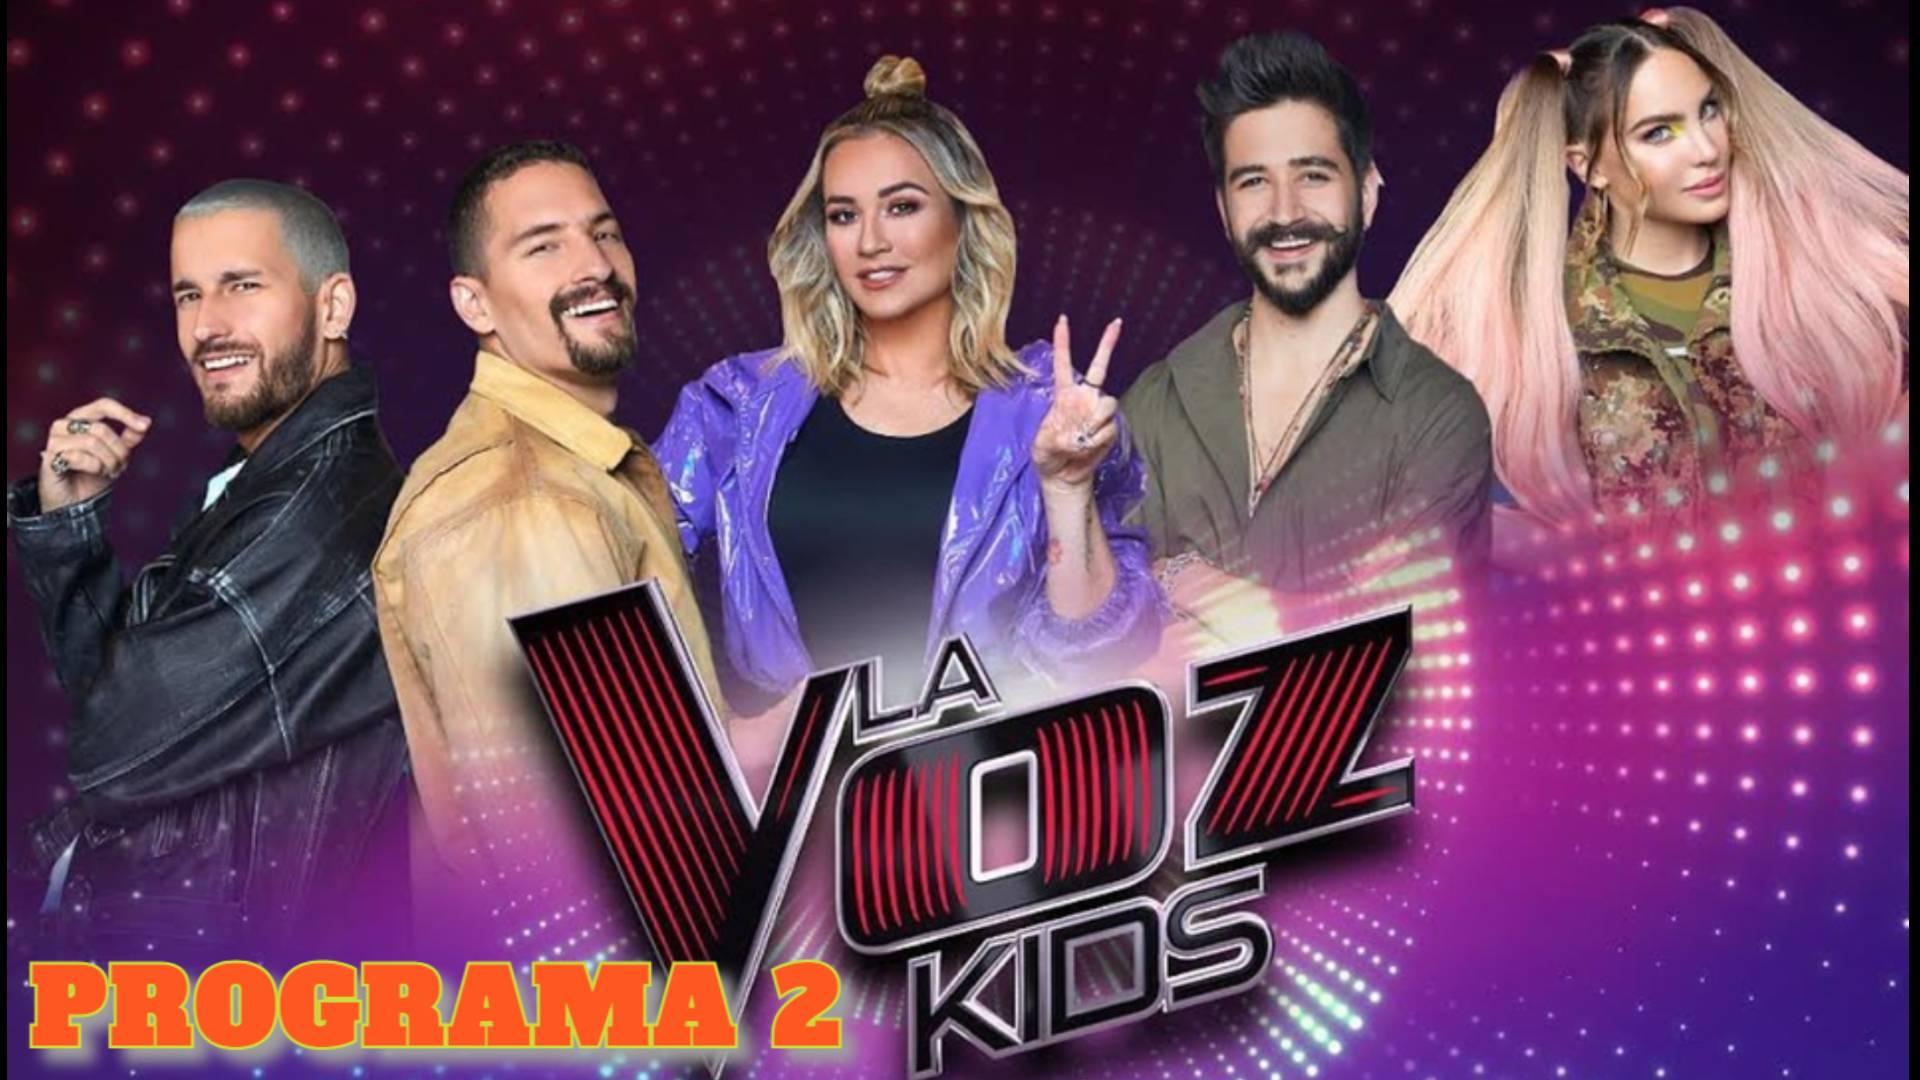 LA VOZ KIDS MEXICO 2021 ONLINE PROGRAMA 2